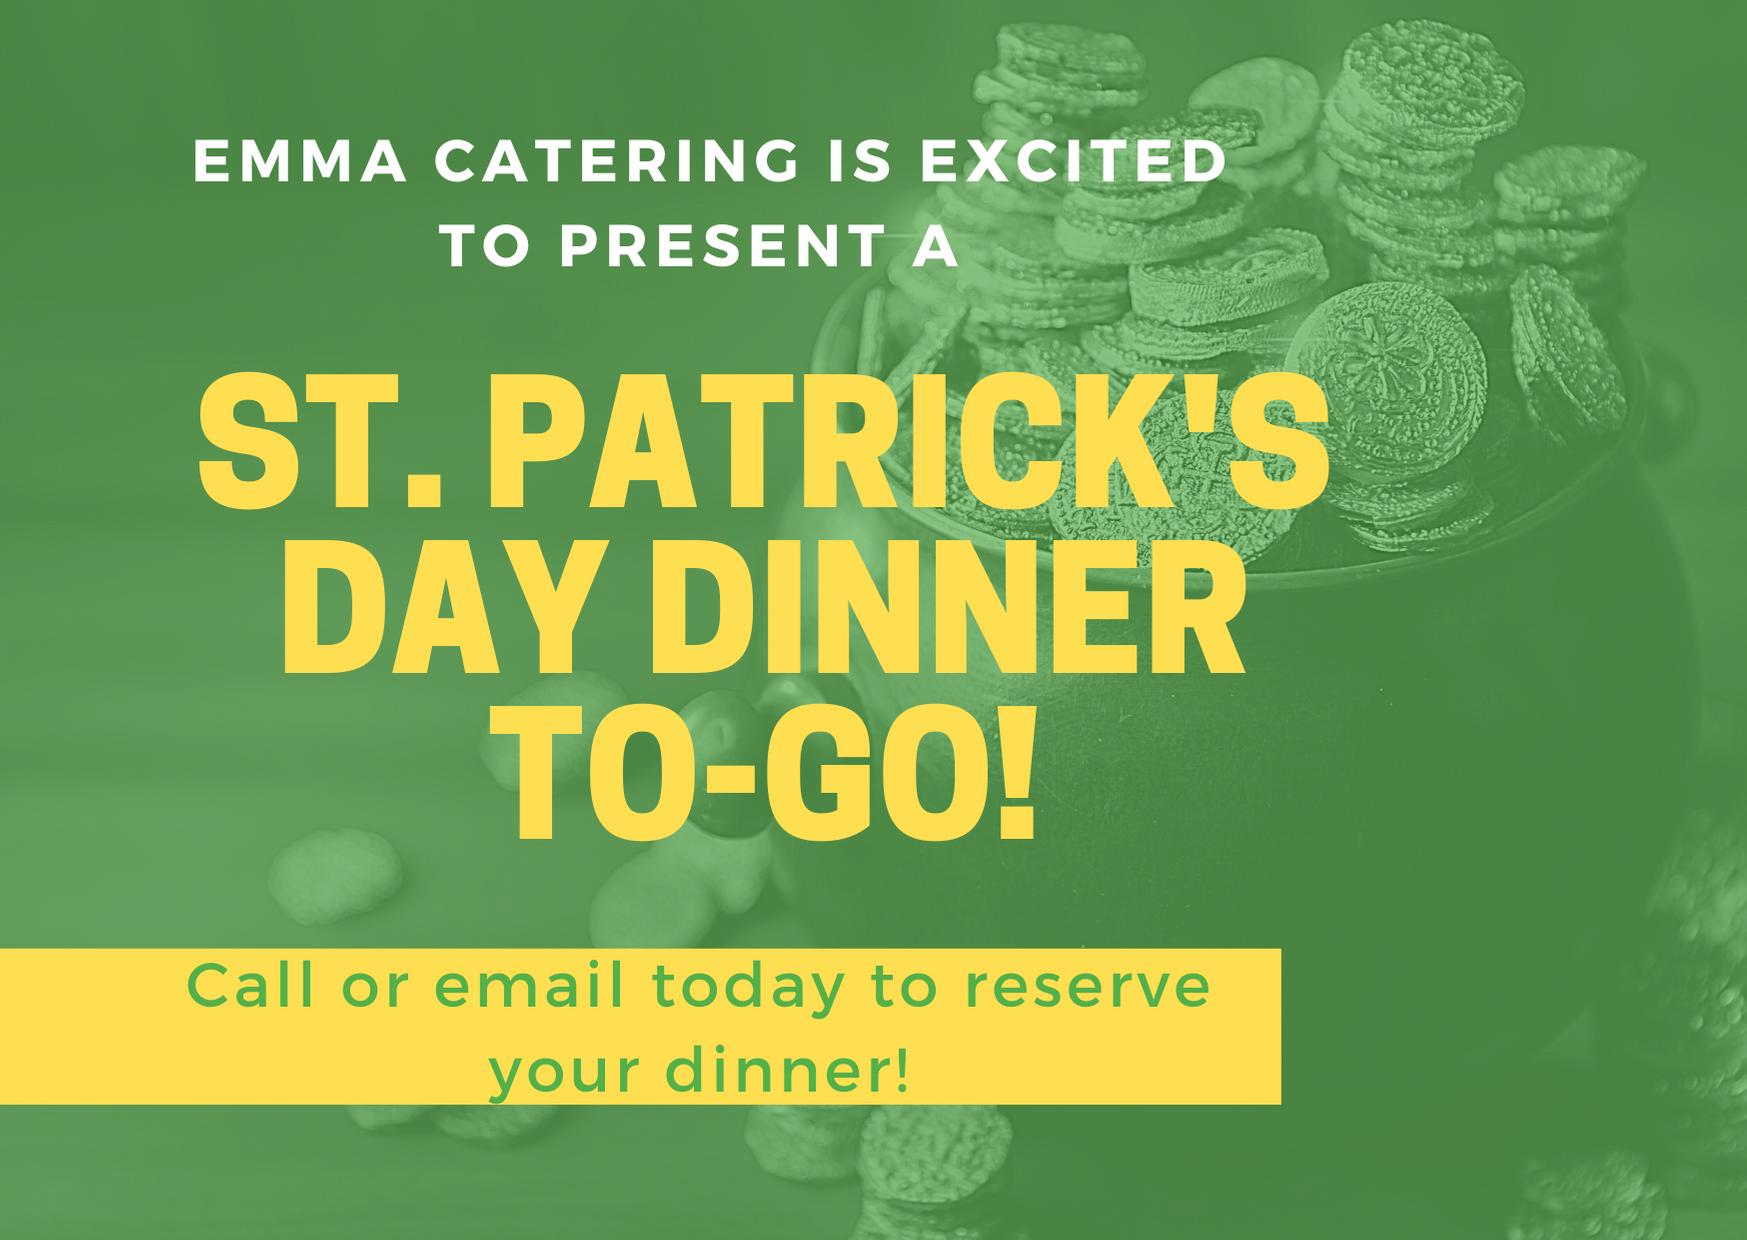 St. Patrick's Day Dinner To-Go